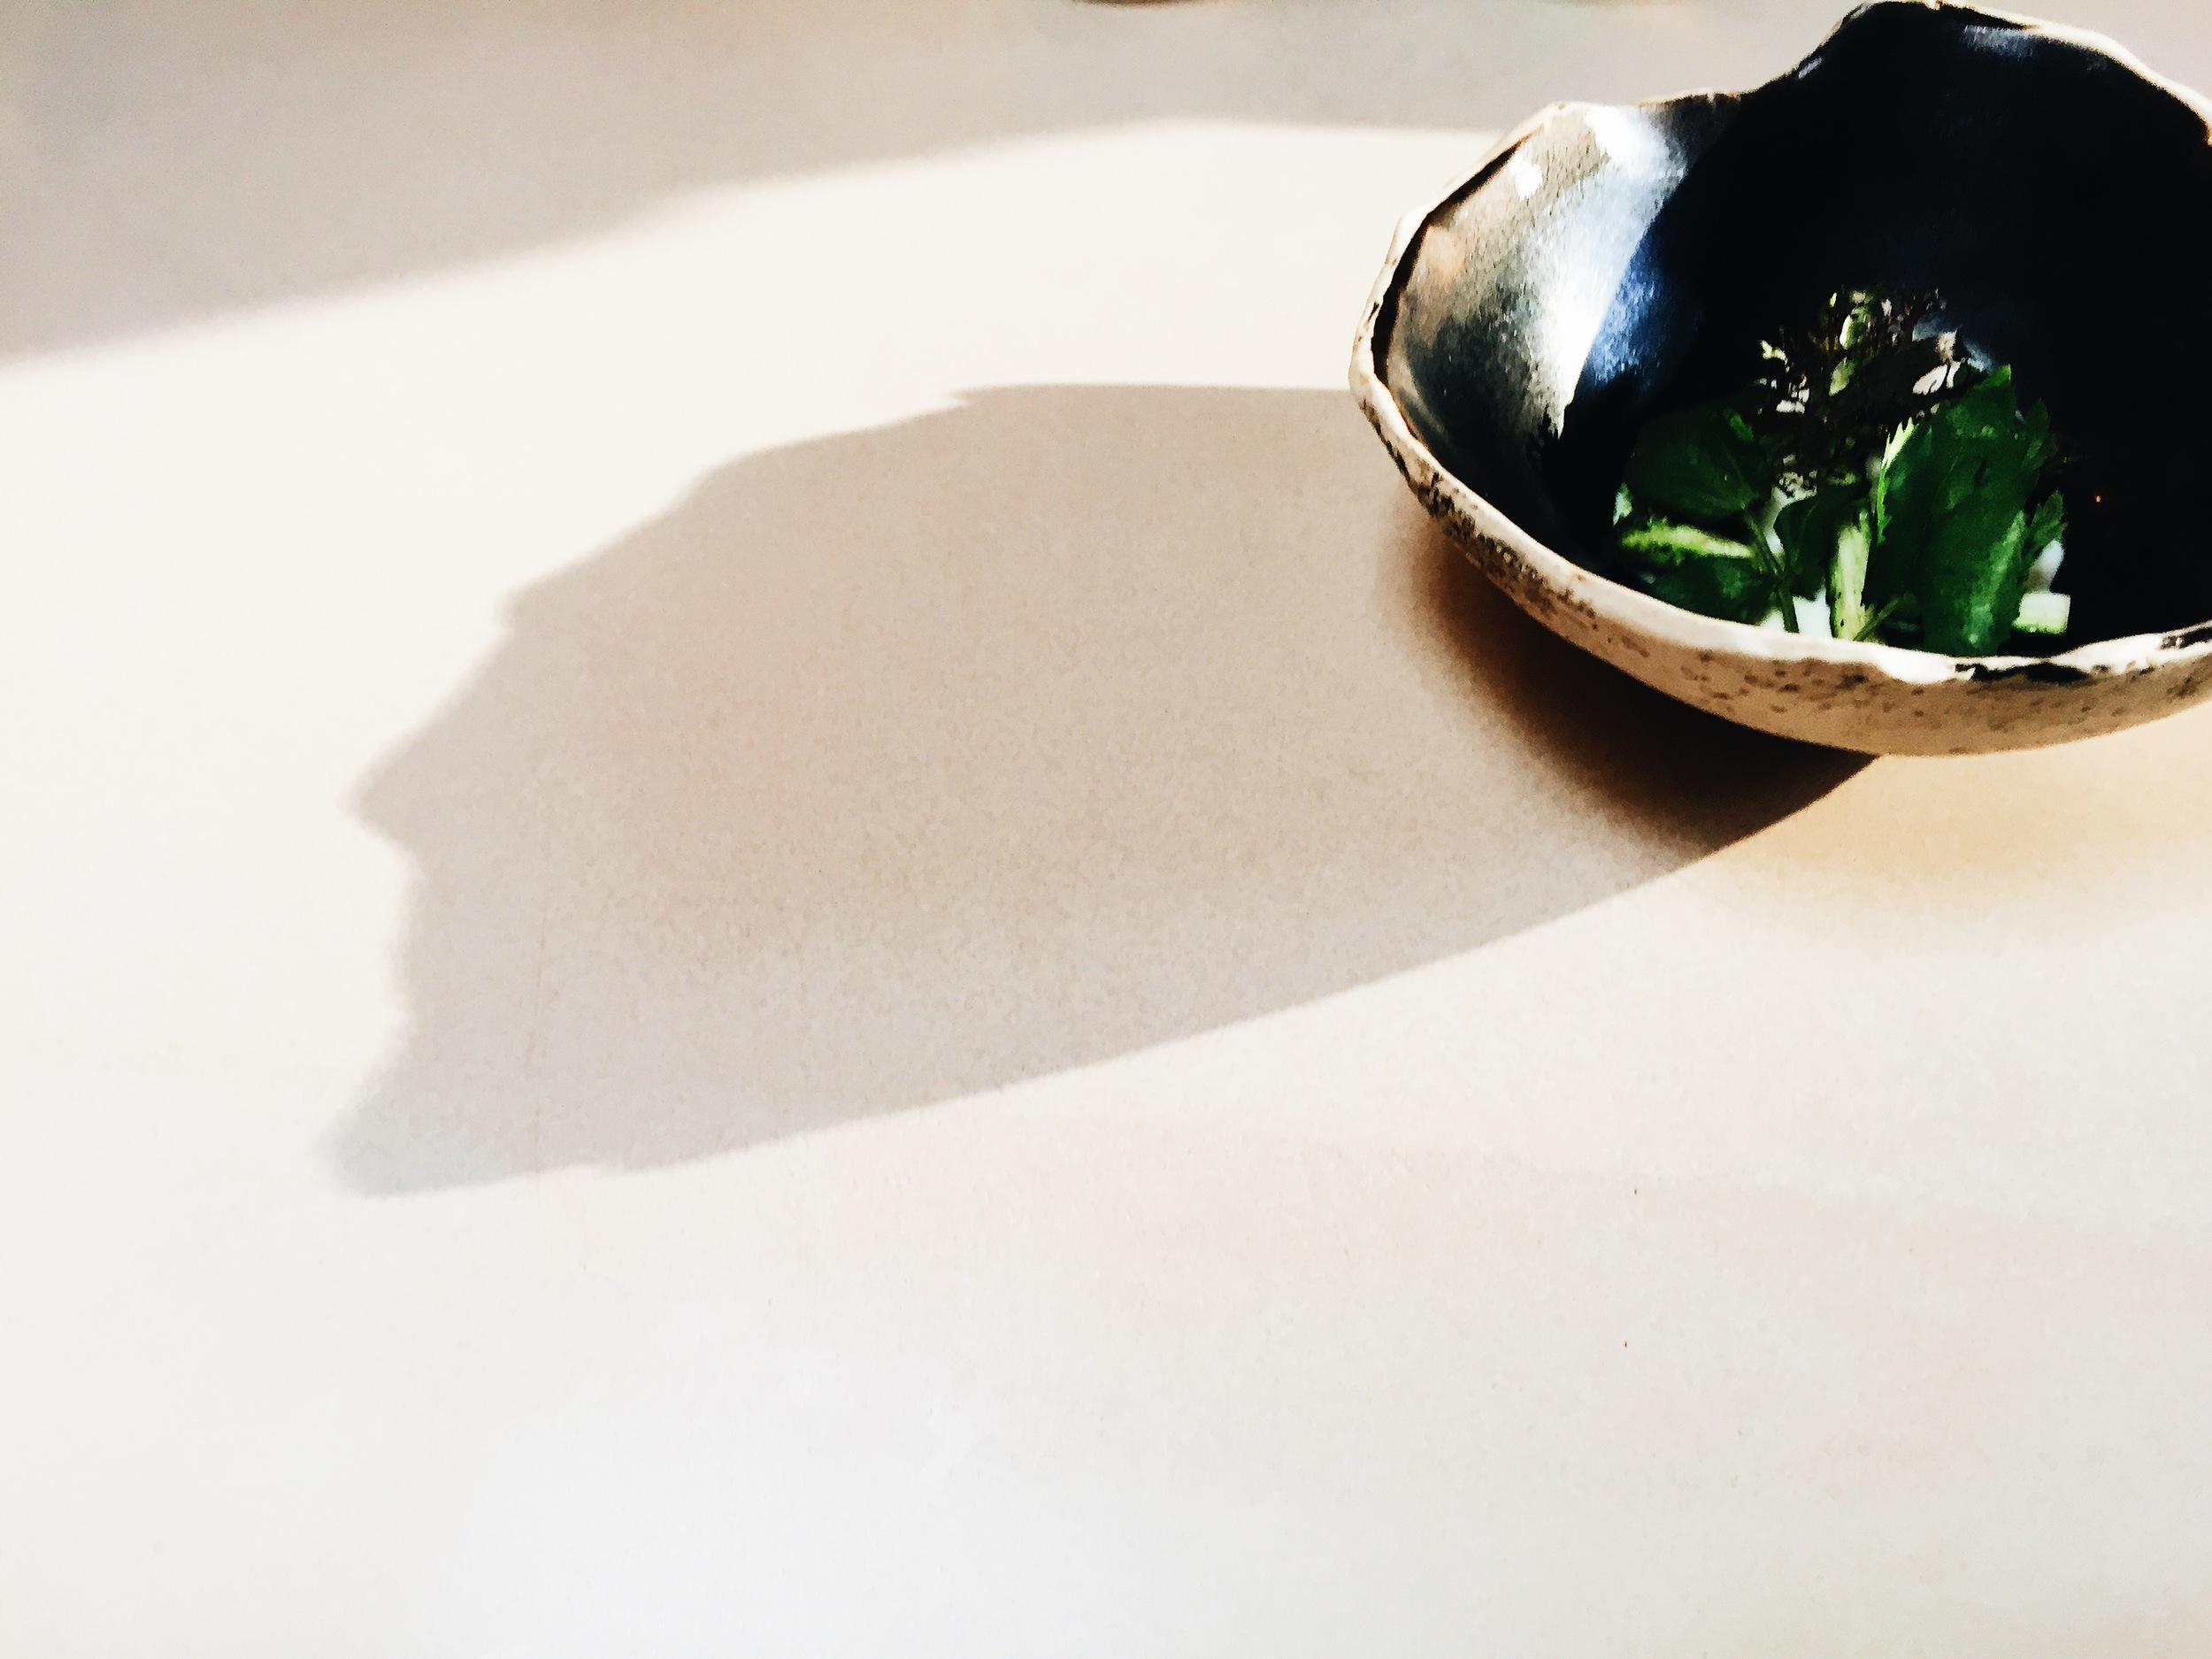 fresh stracciatella with asparagus